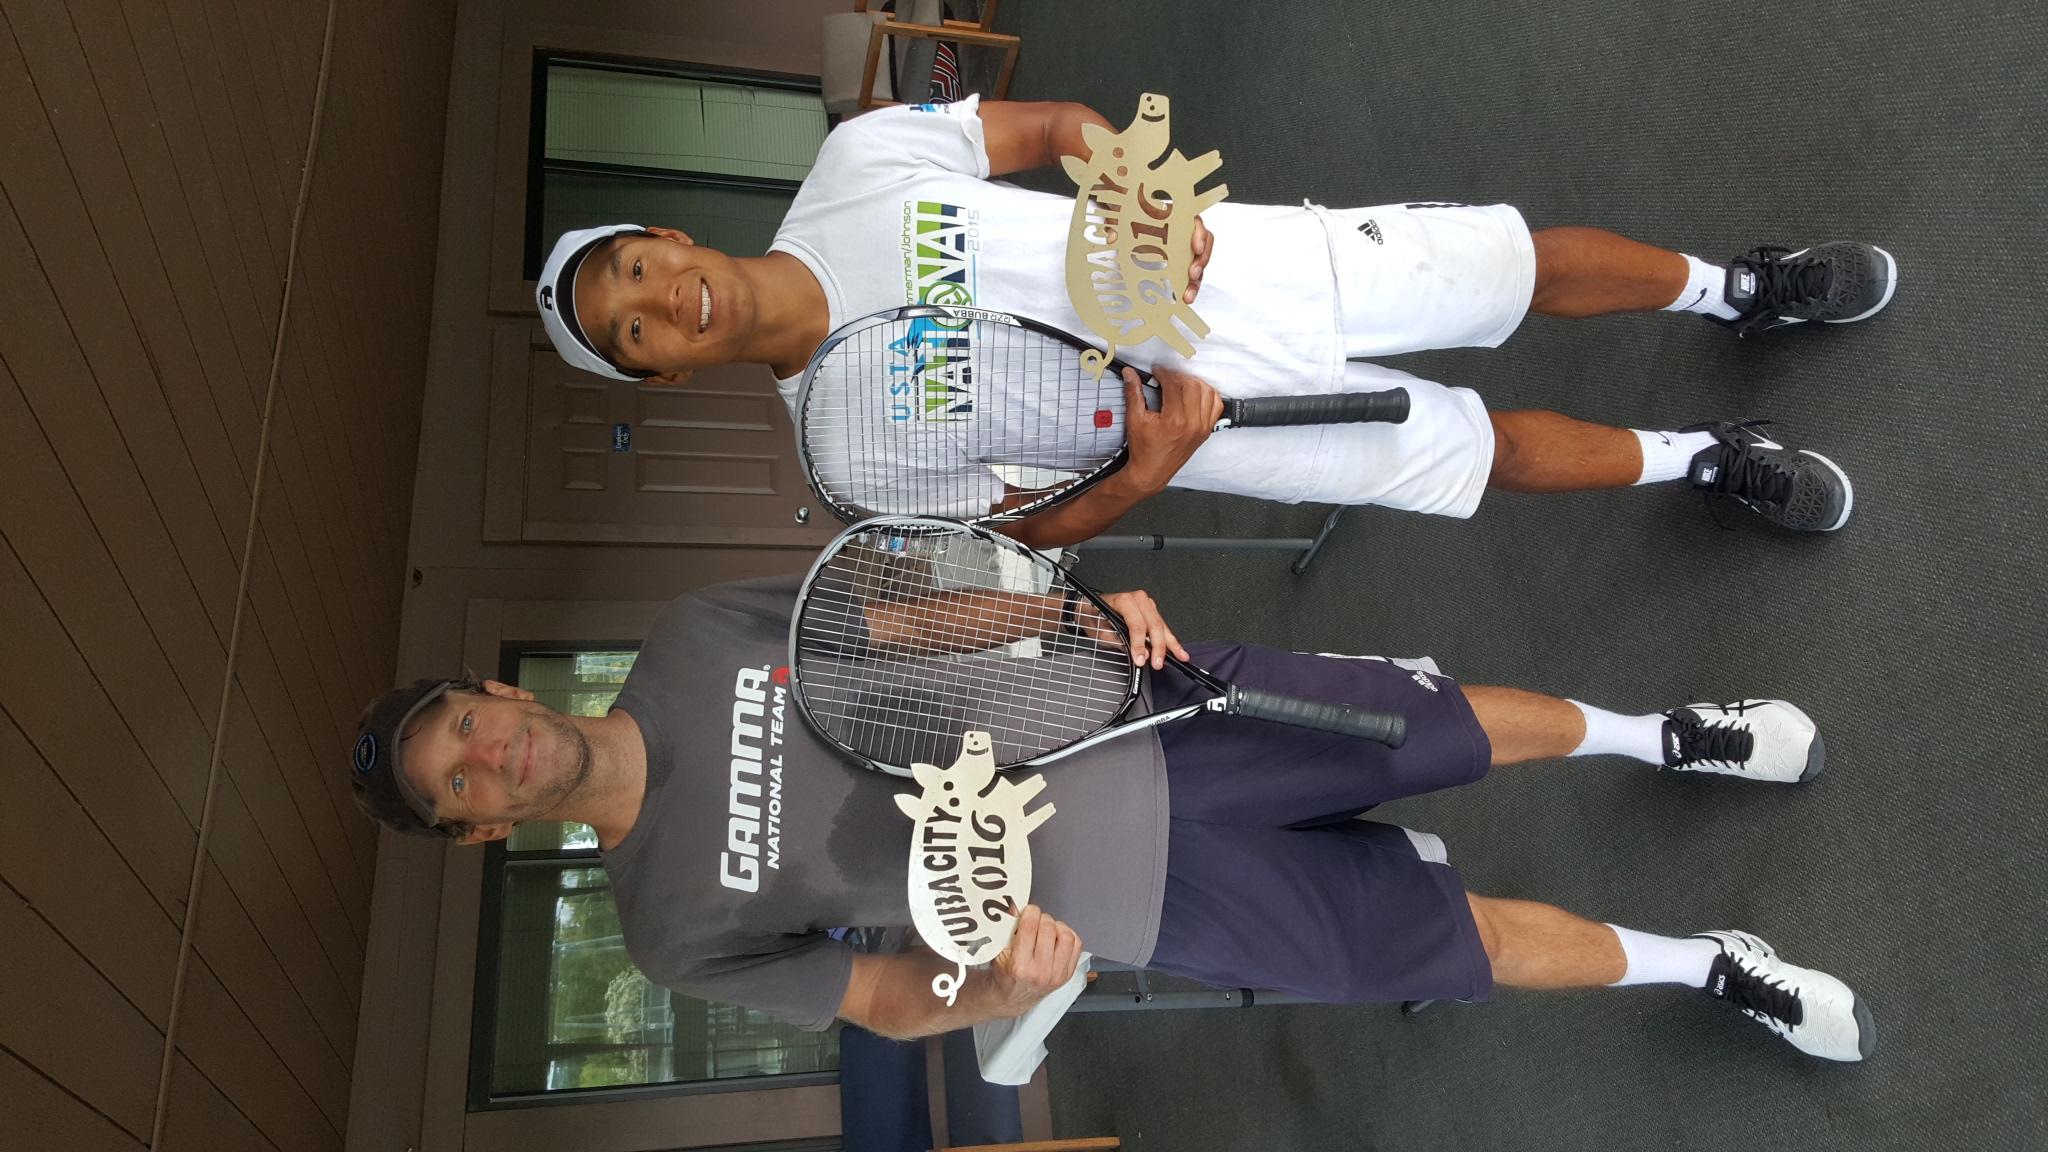 Yuba Open Men's Doubles Champions 2016